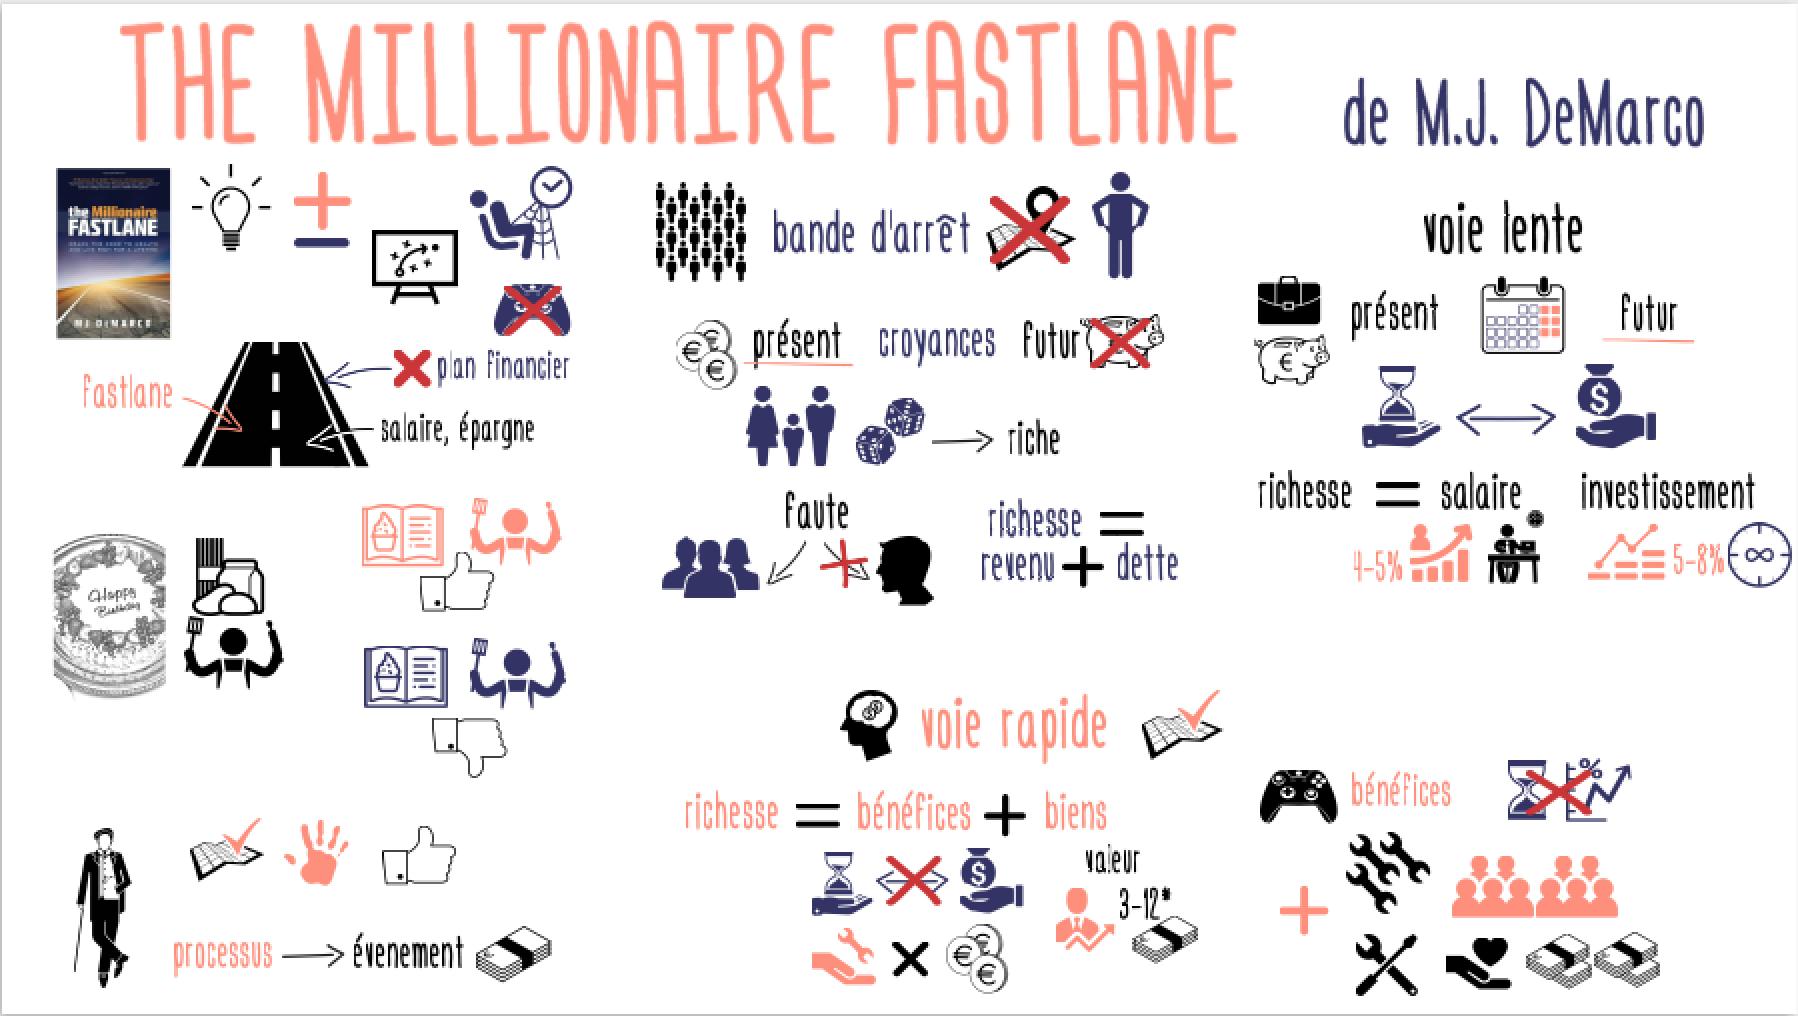 TheMillionaireFastline